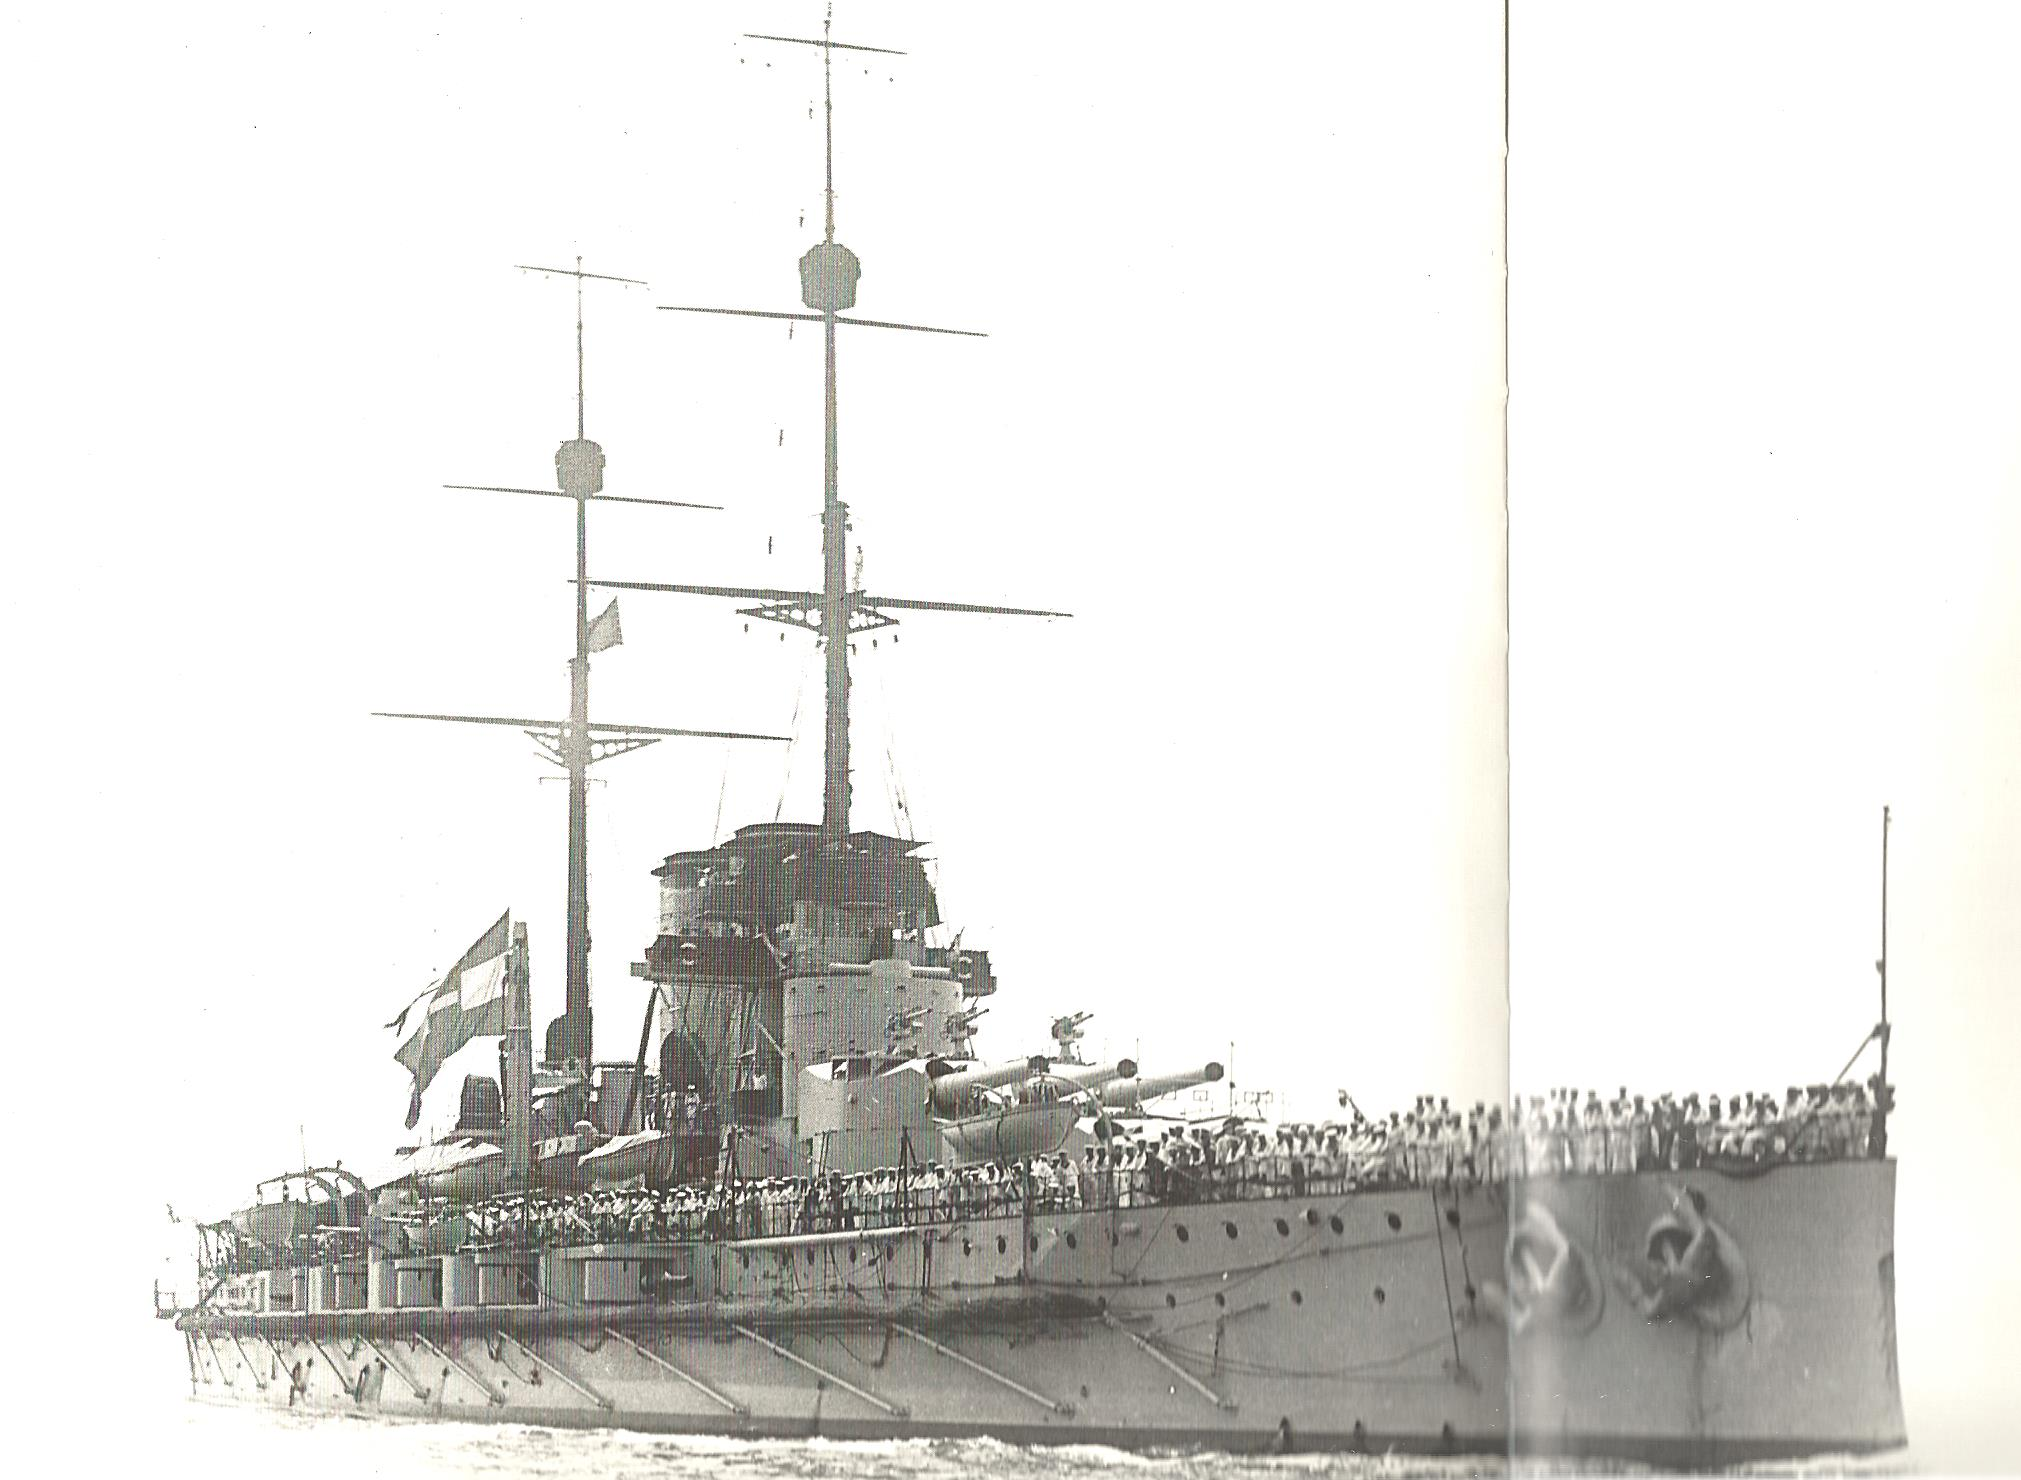 1914 Viribus unitis mit särgen l